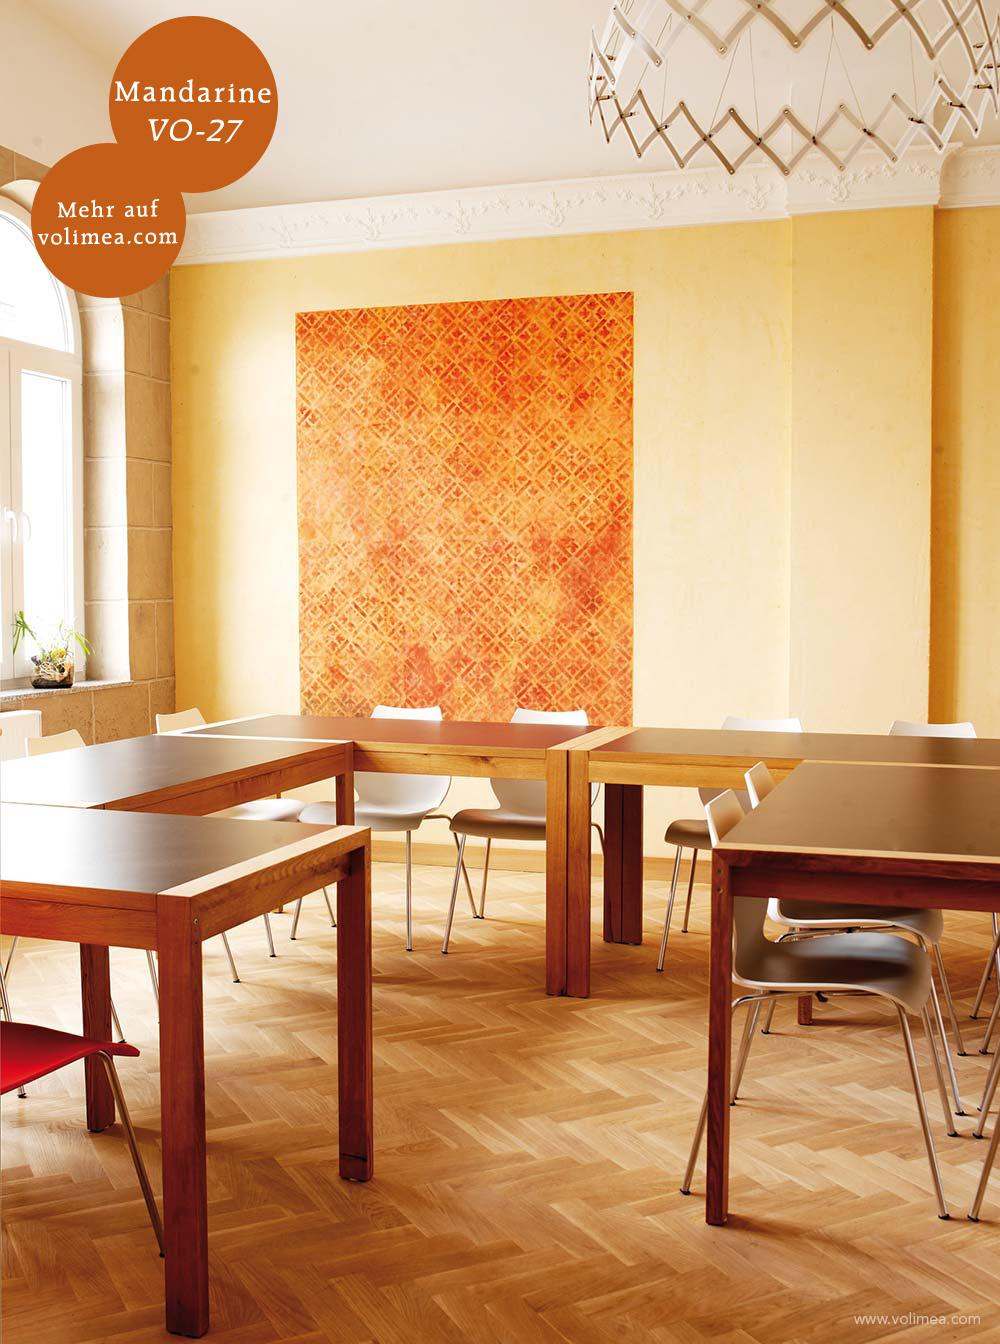 Mikrozement fugenlose Volimea Wandbeschichtung im Büro - Mandarine VO-27 schabloniert